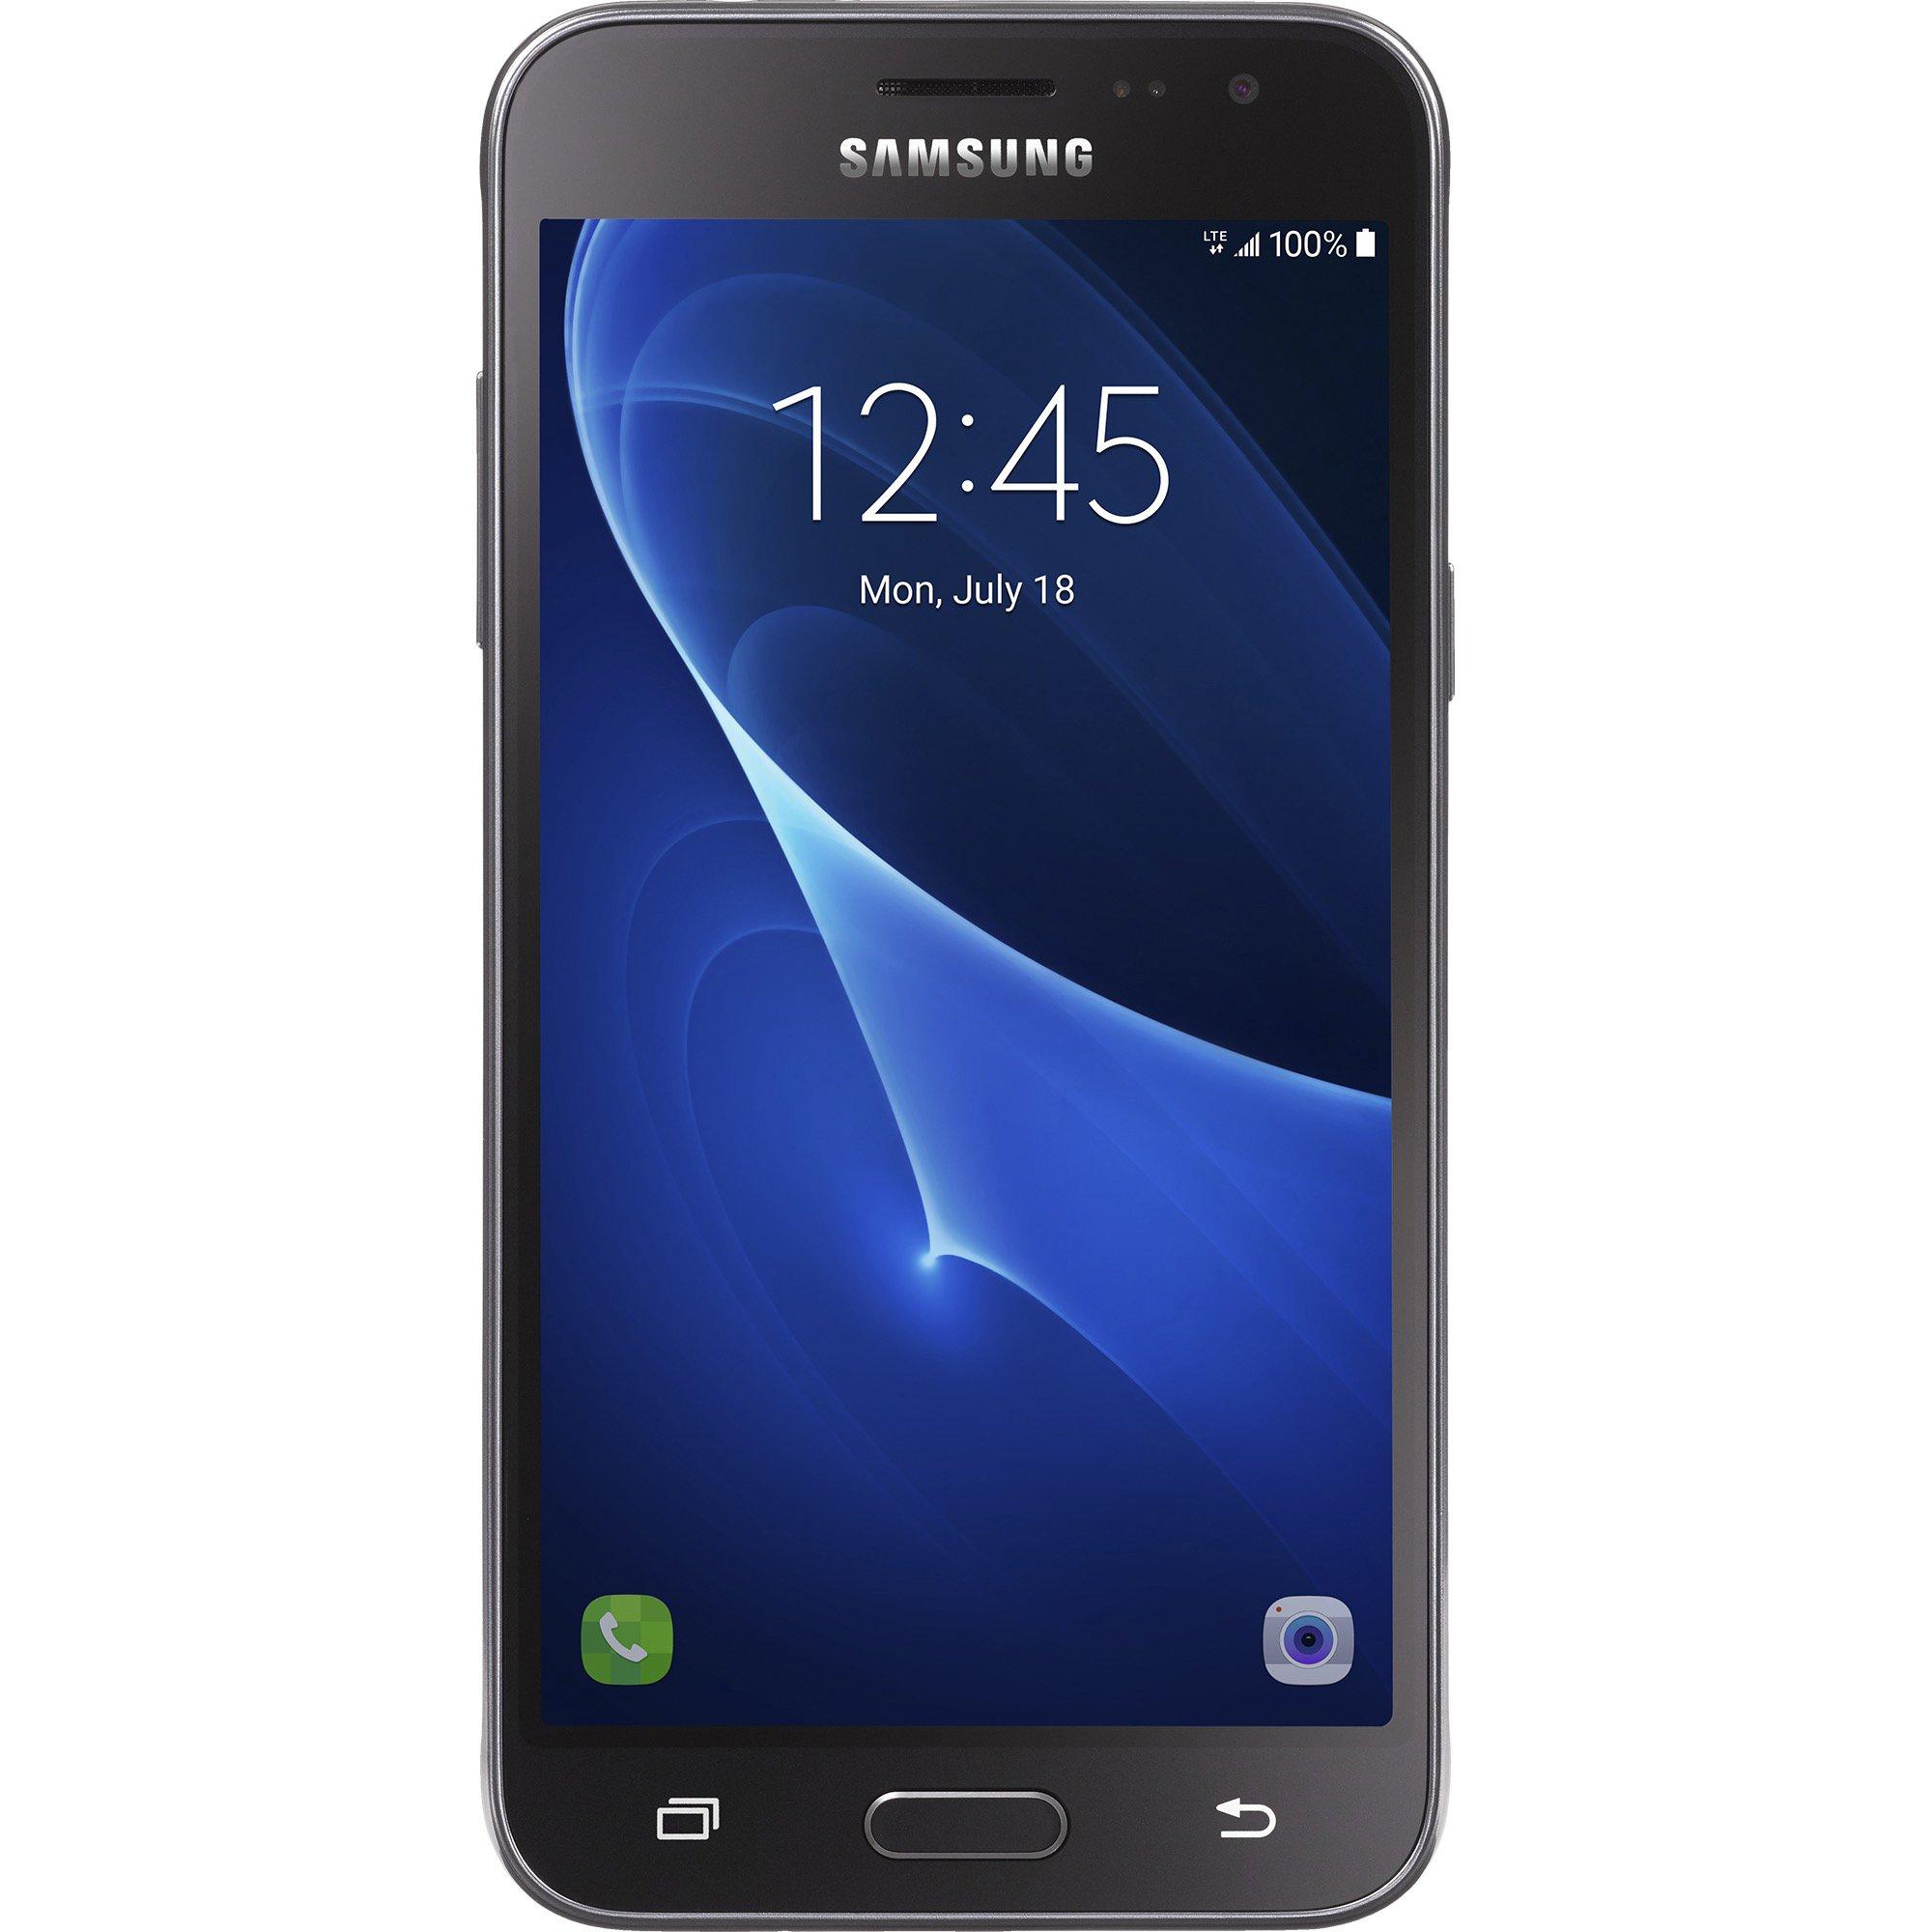 Net10 Samsung Galaxy J1 Luna 4G LTE Prepaid Smartphone